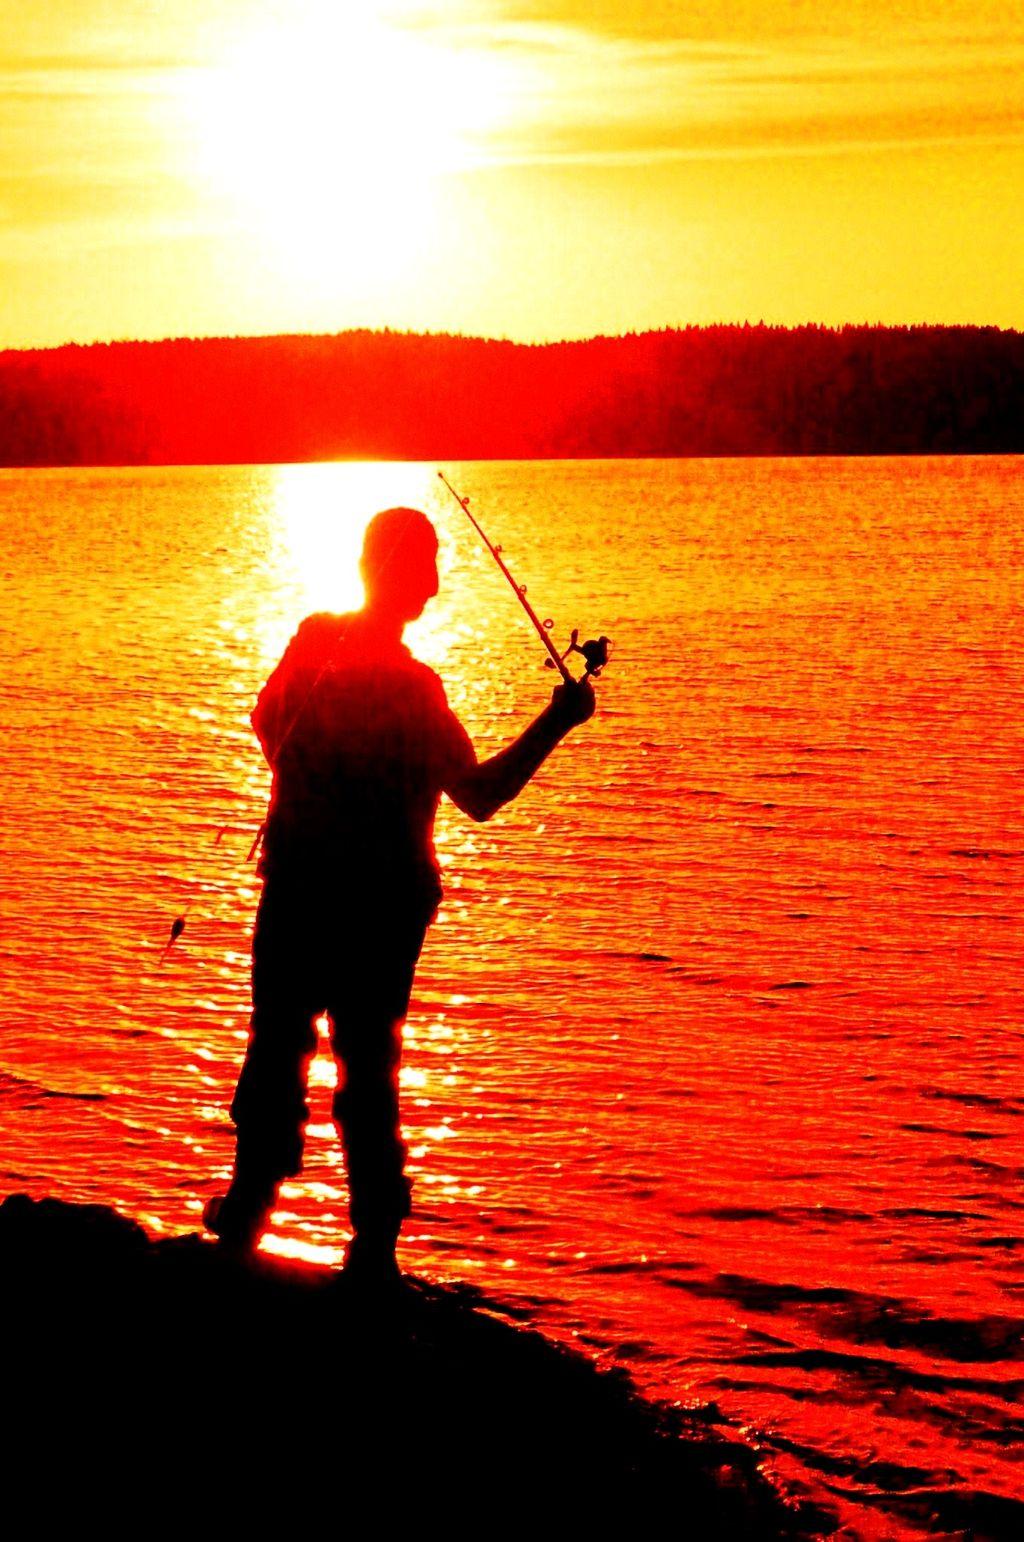 Название: рыбалка на закате.JPG Просмотров: 290  Размер: 253.8 Кб